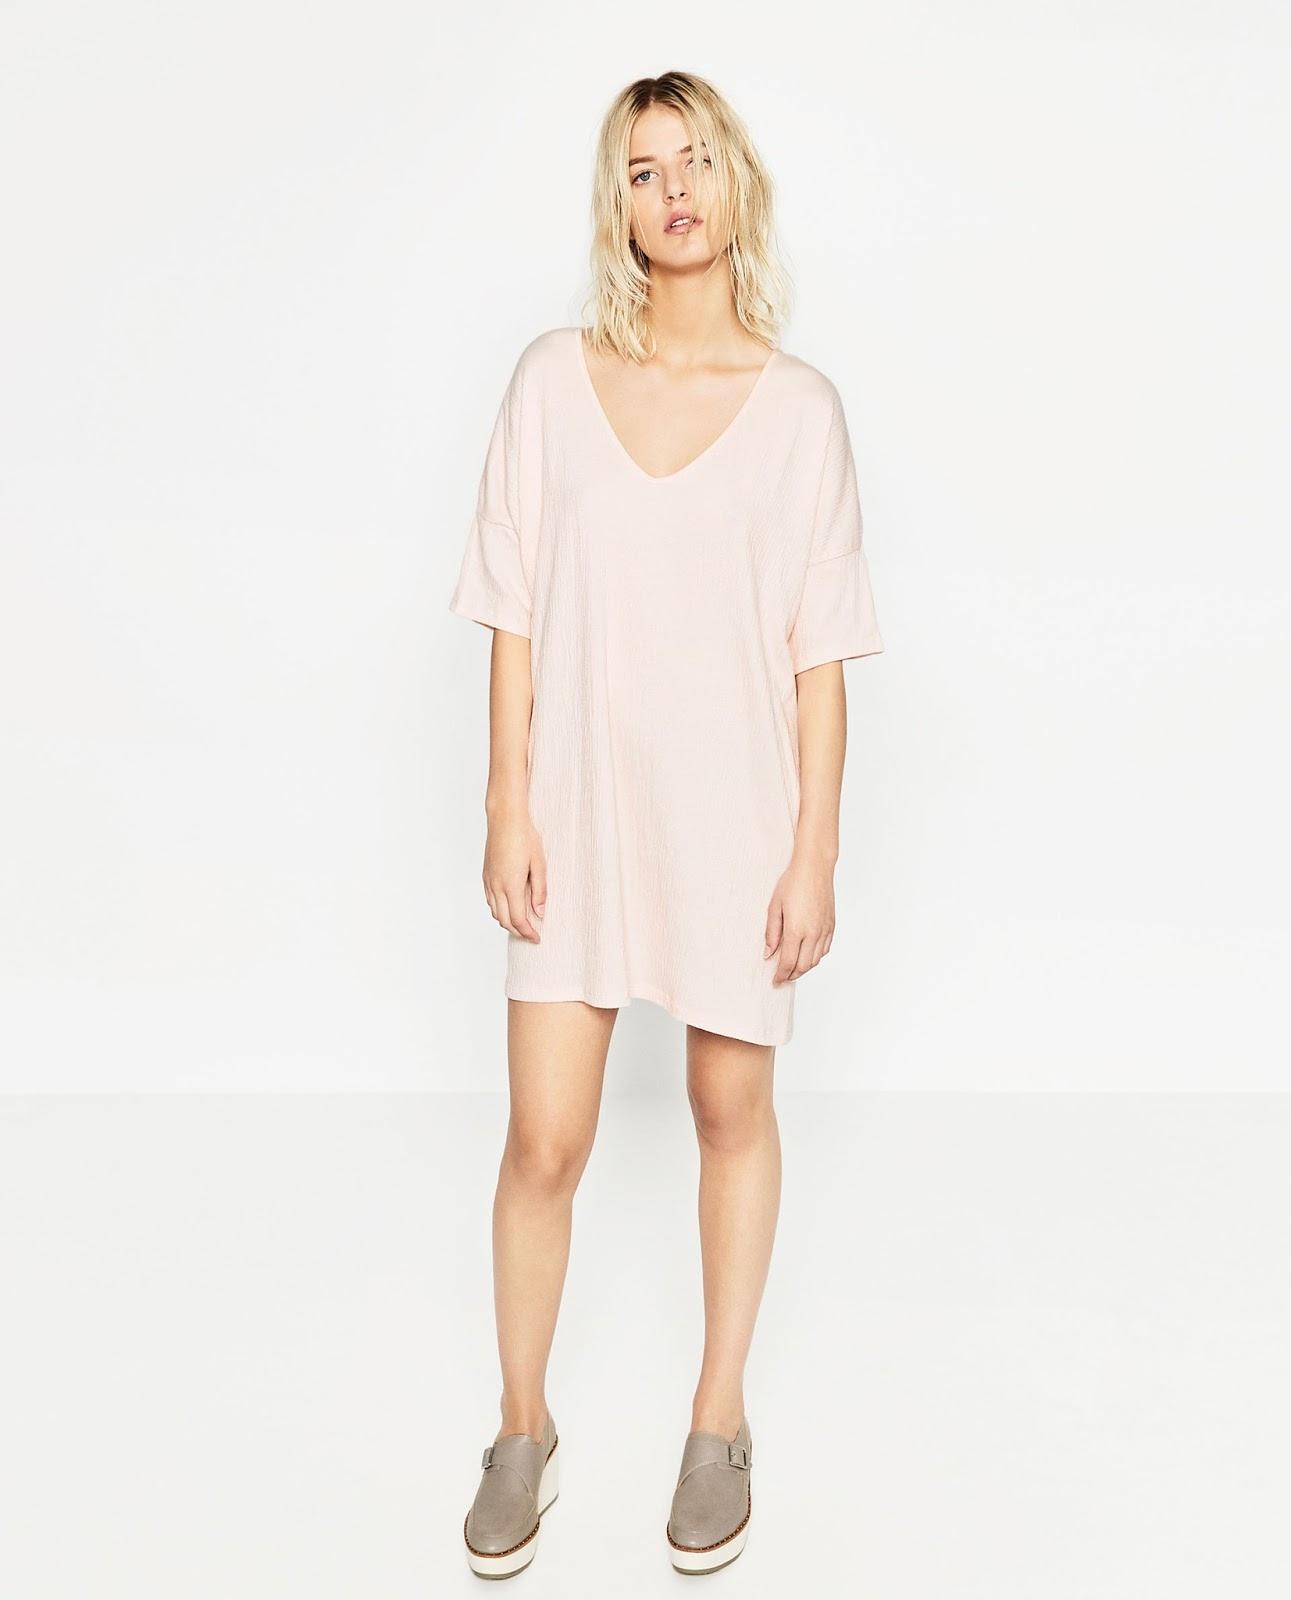 Zara blush dress